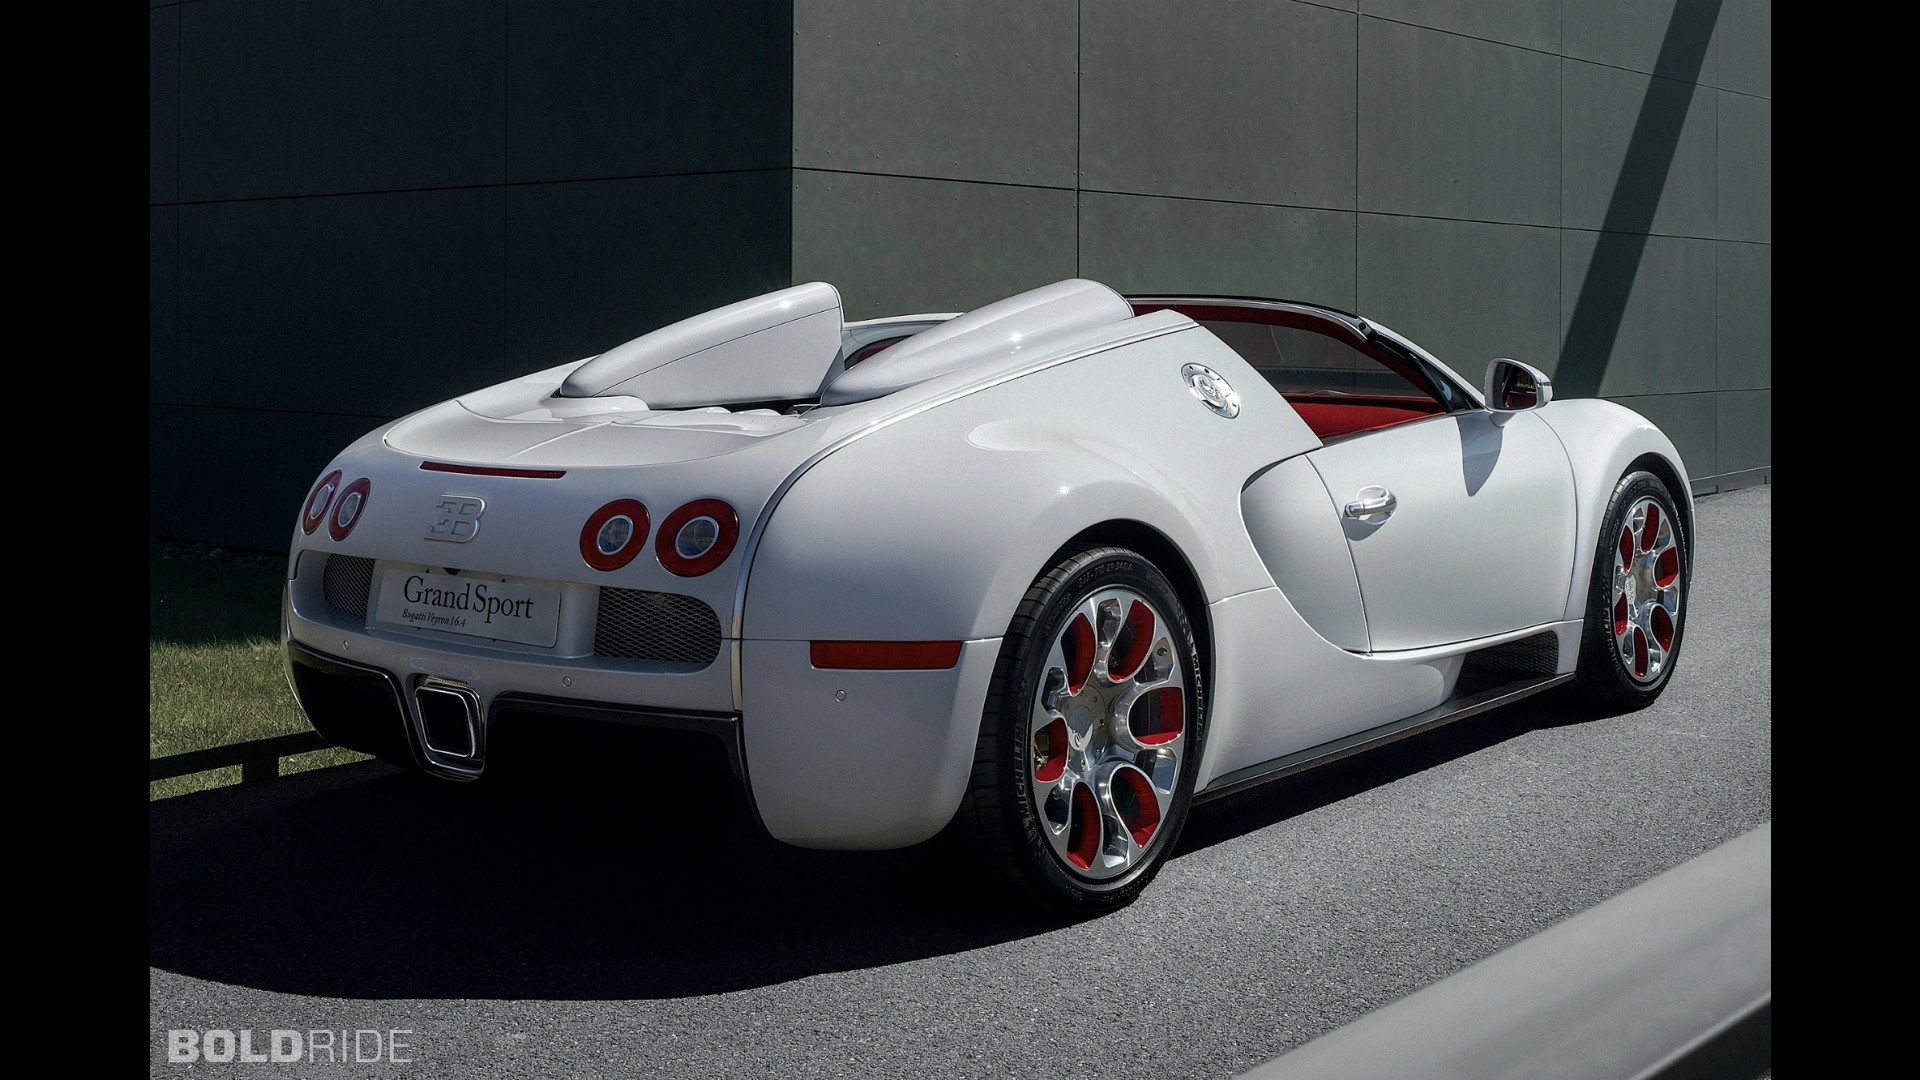 bugatti-veyron-grand-sport-wei-long Stunning Bugatti Veyron 16.4 Grand Sport Vitesse Interior Cars Trend